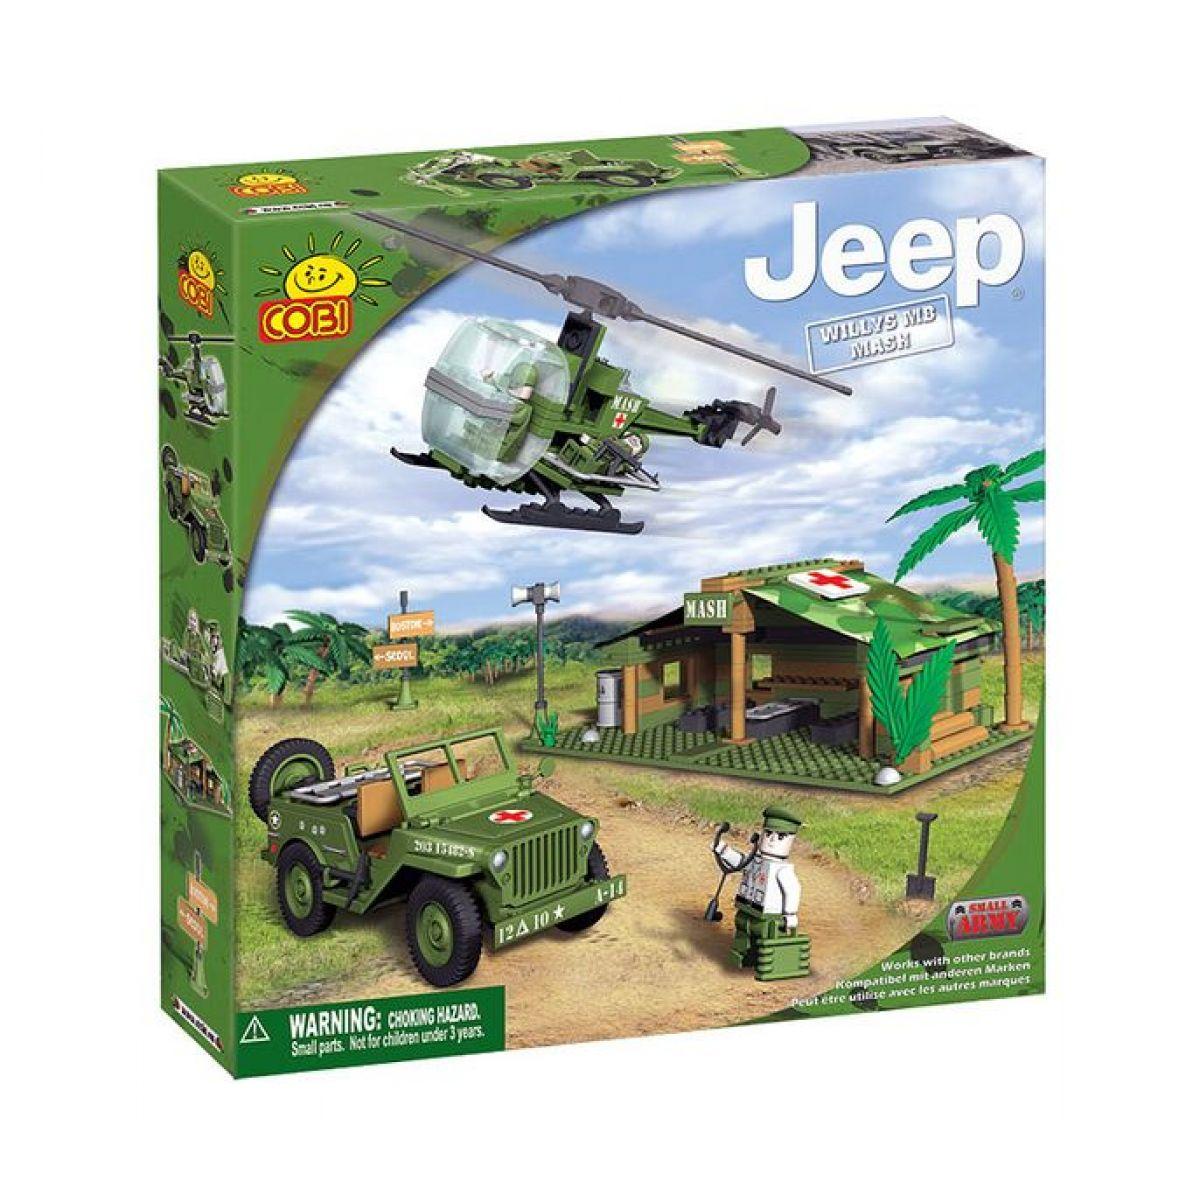 Cobi Jeep 24300 Jeep Willys polní nemocnice